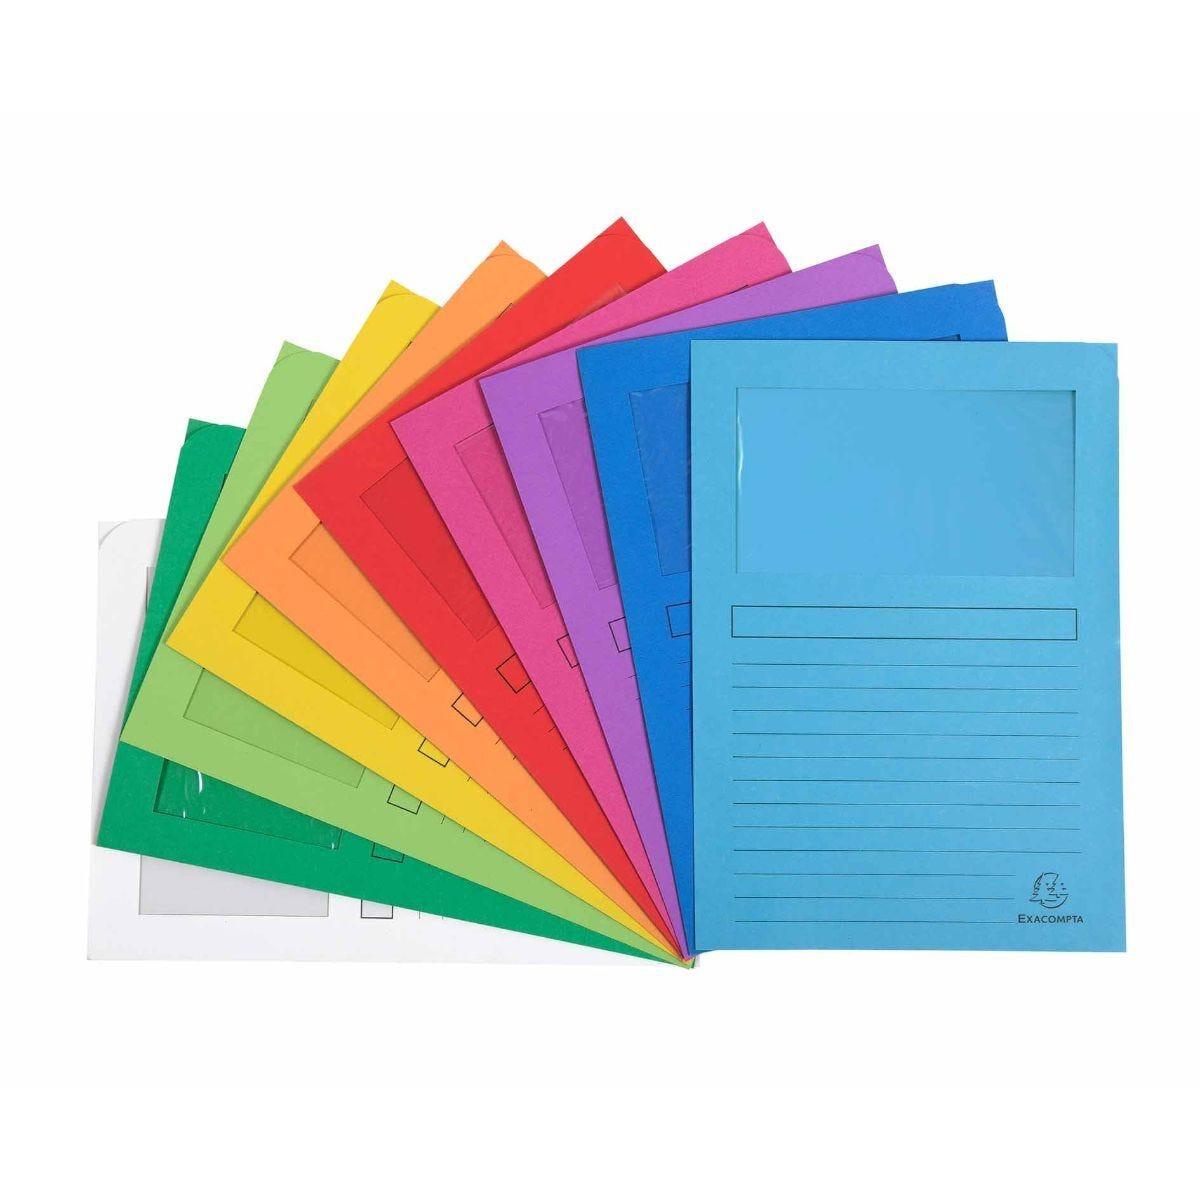 Exacompta Forever Window Folder A4 8 Packs of 50 120g Assorted